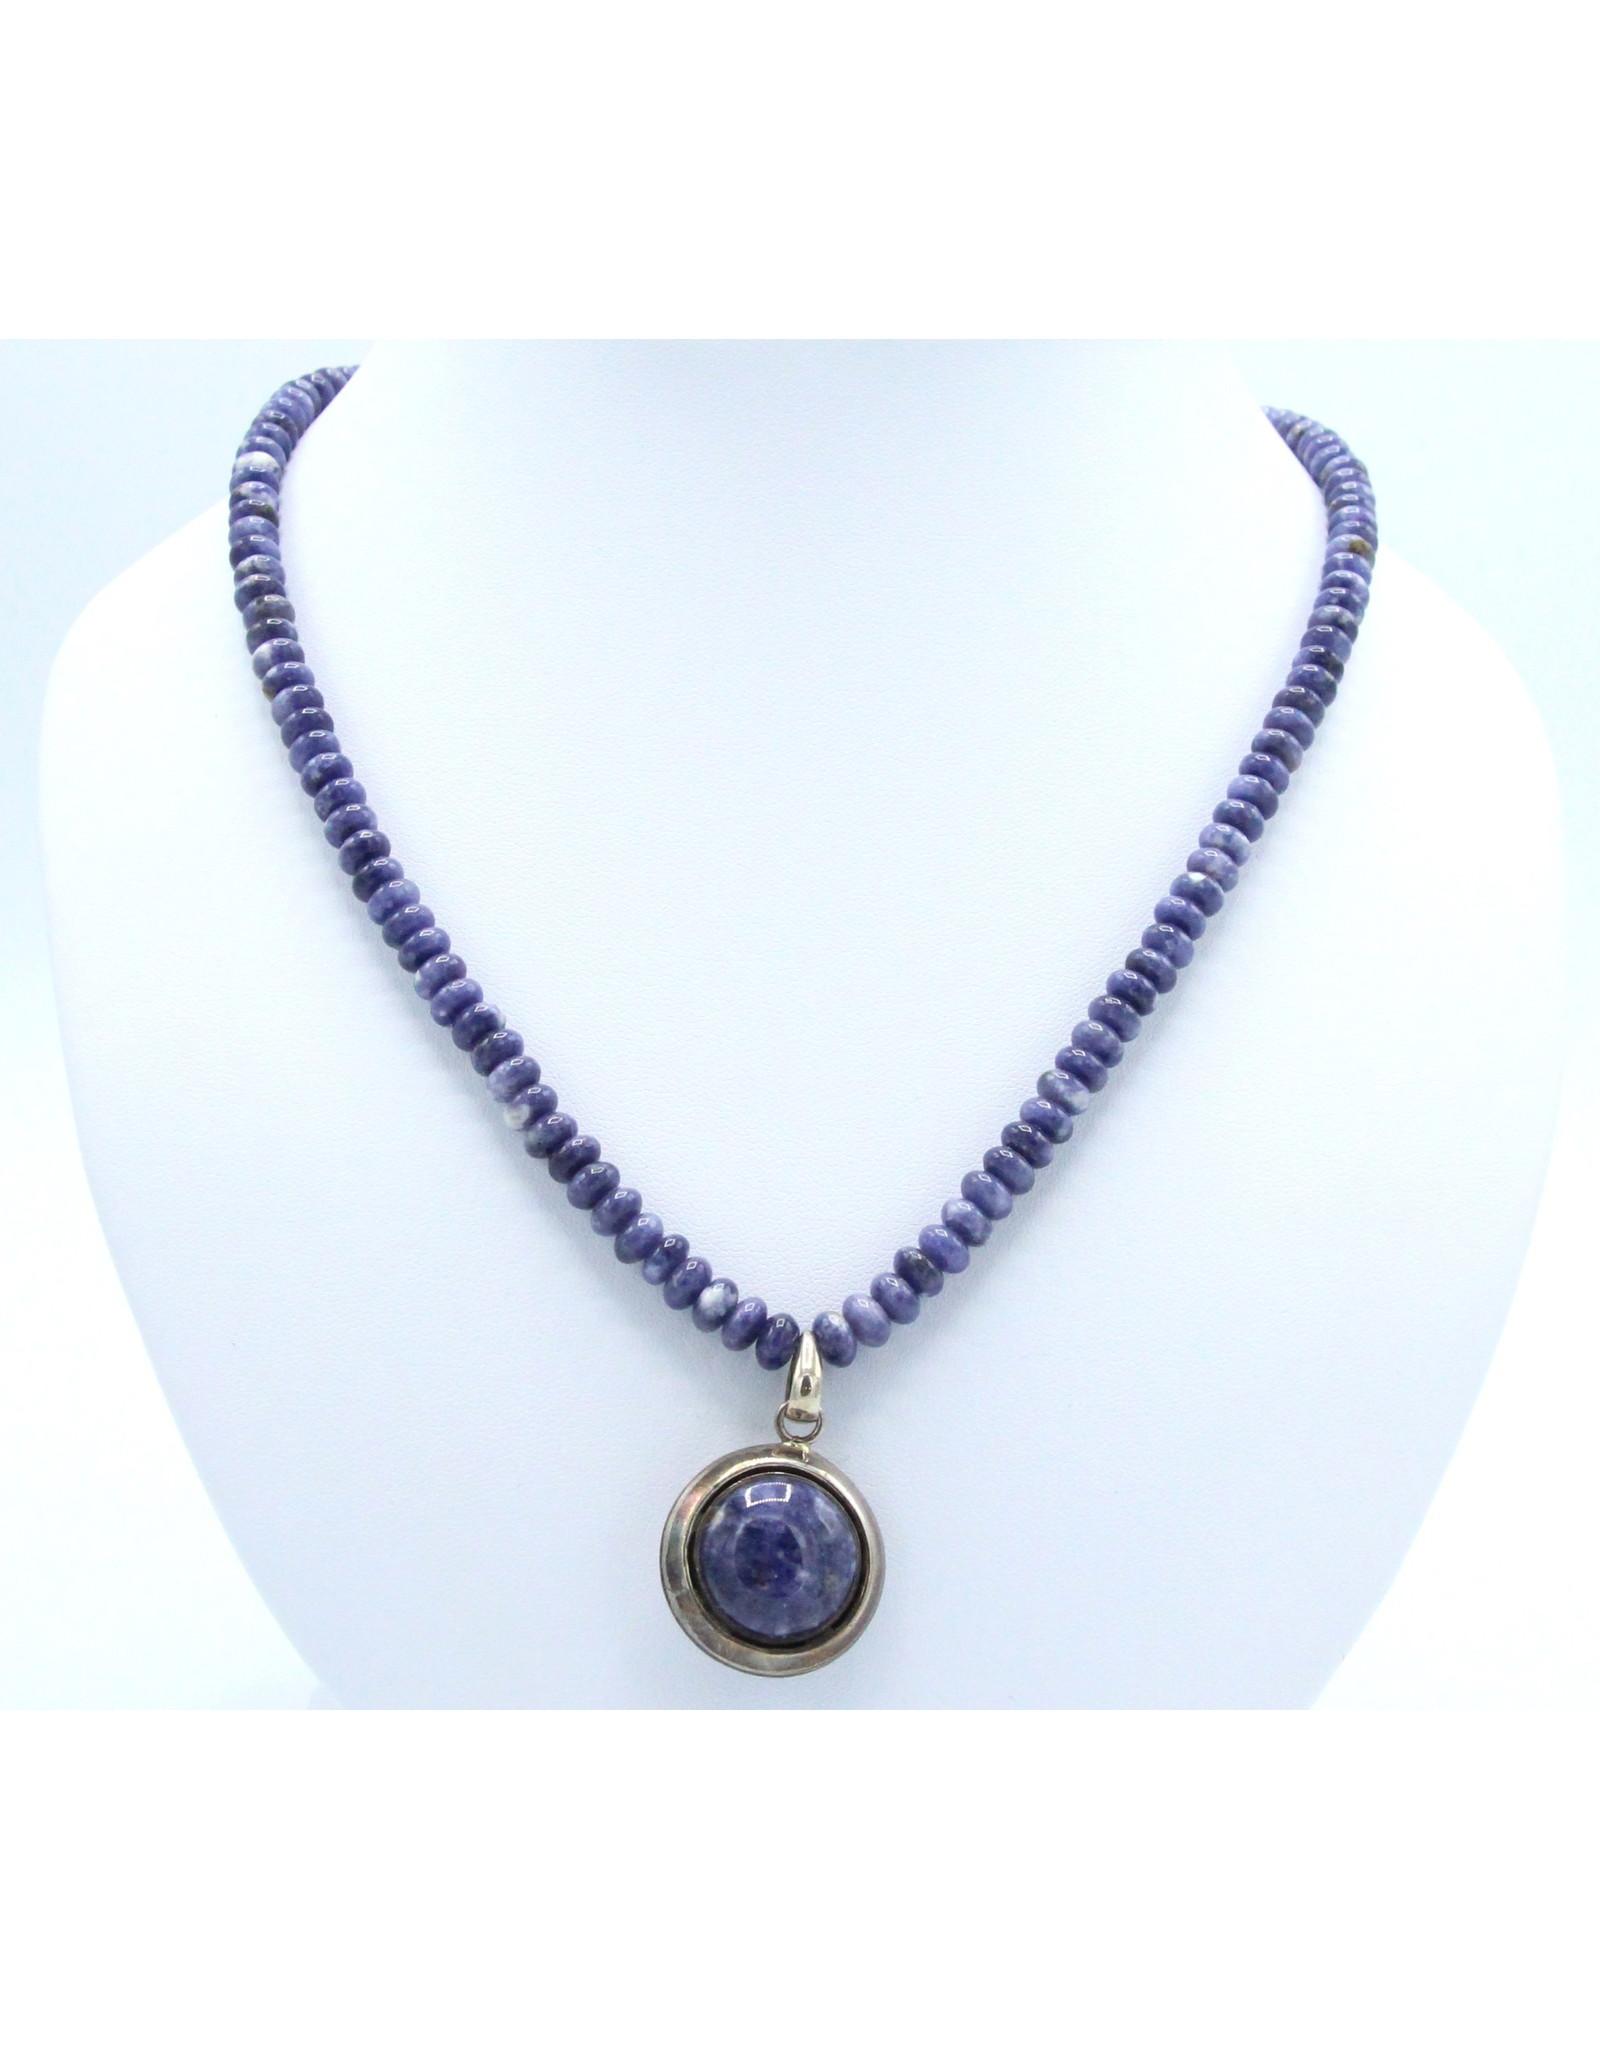 Scapolite Necklace - NSCAP01